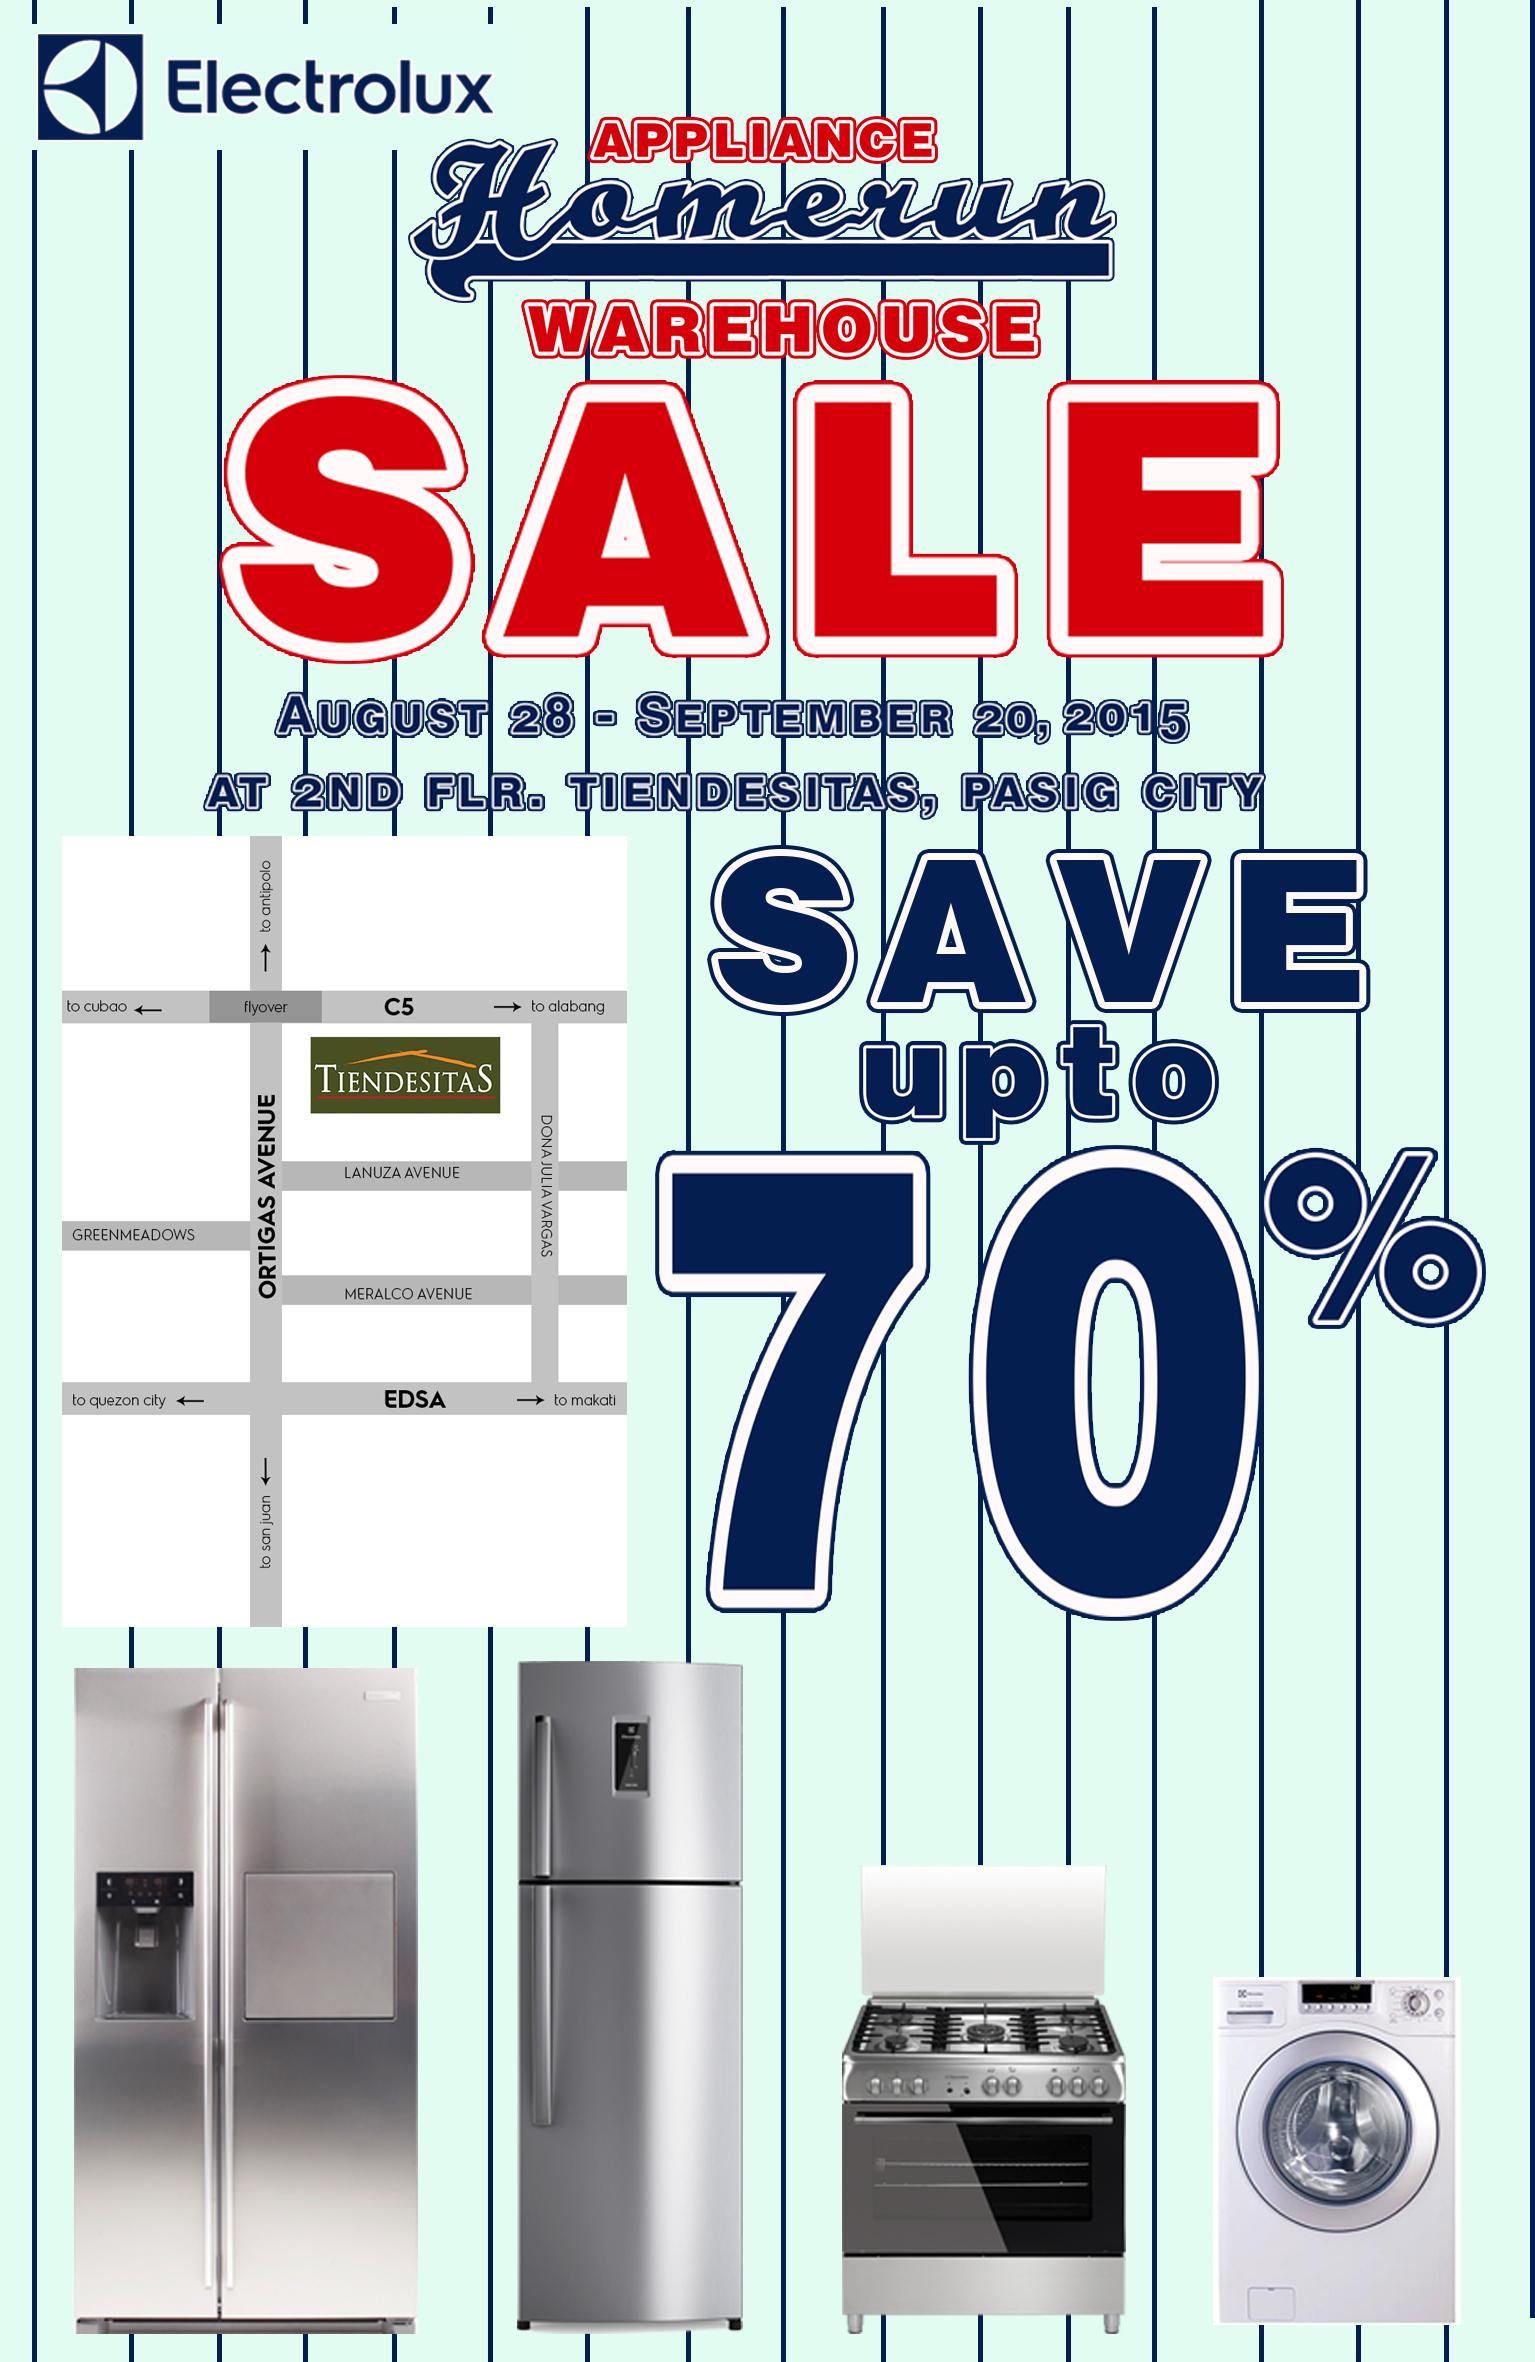 Electrolux Appliance Homerun Warehouse Sale @ Tiendesitas August - September 2015